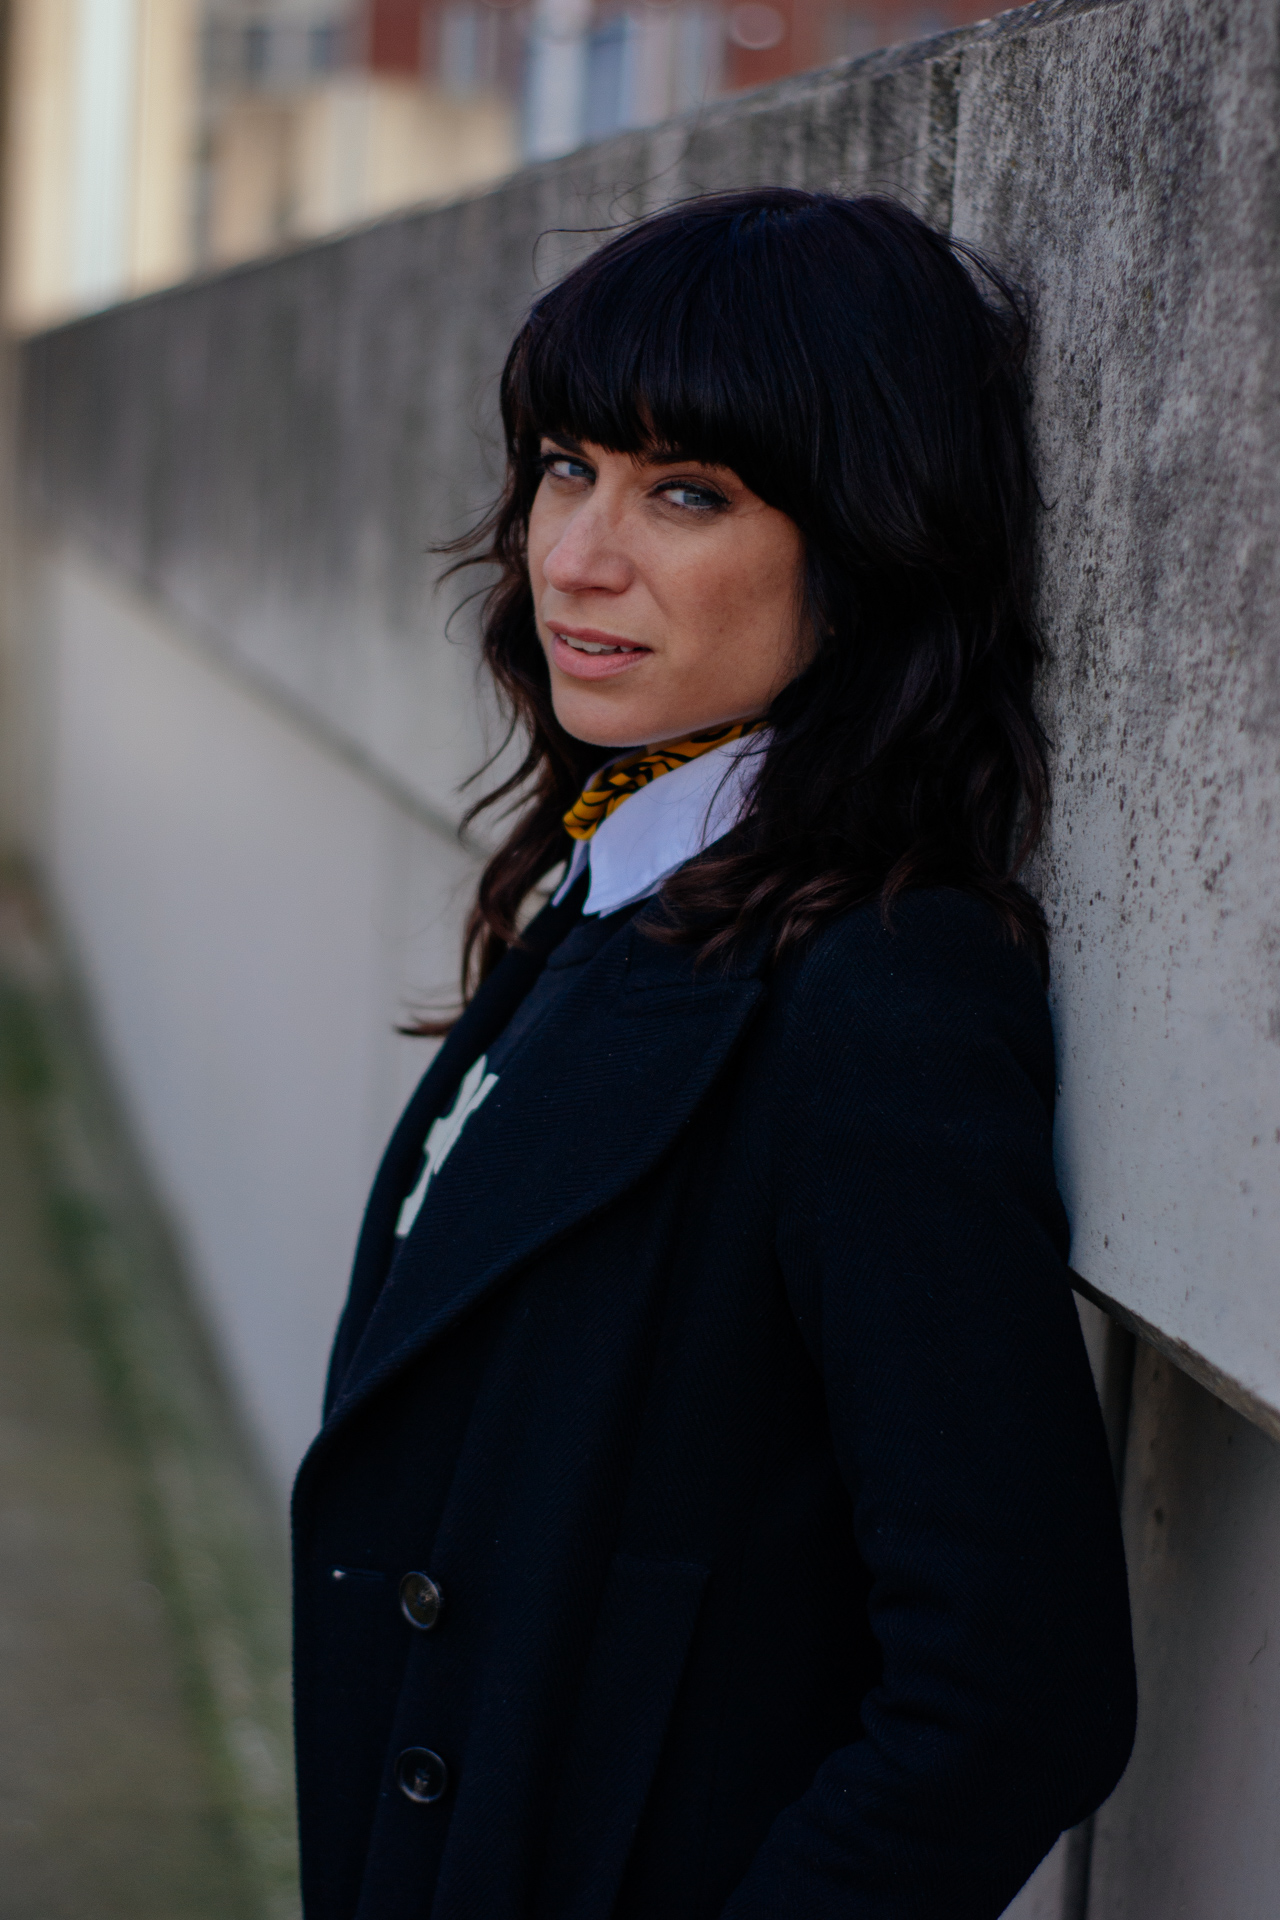 Nicole Atkins (Photo by Matthijs van der Ven for The Influences)